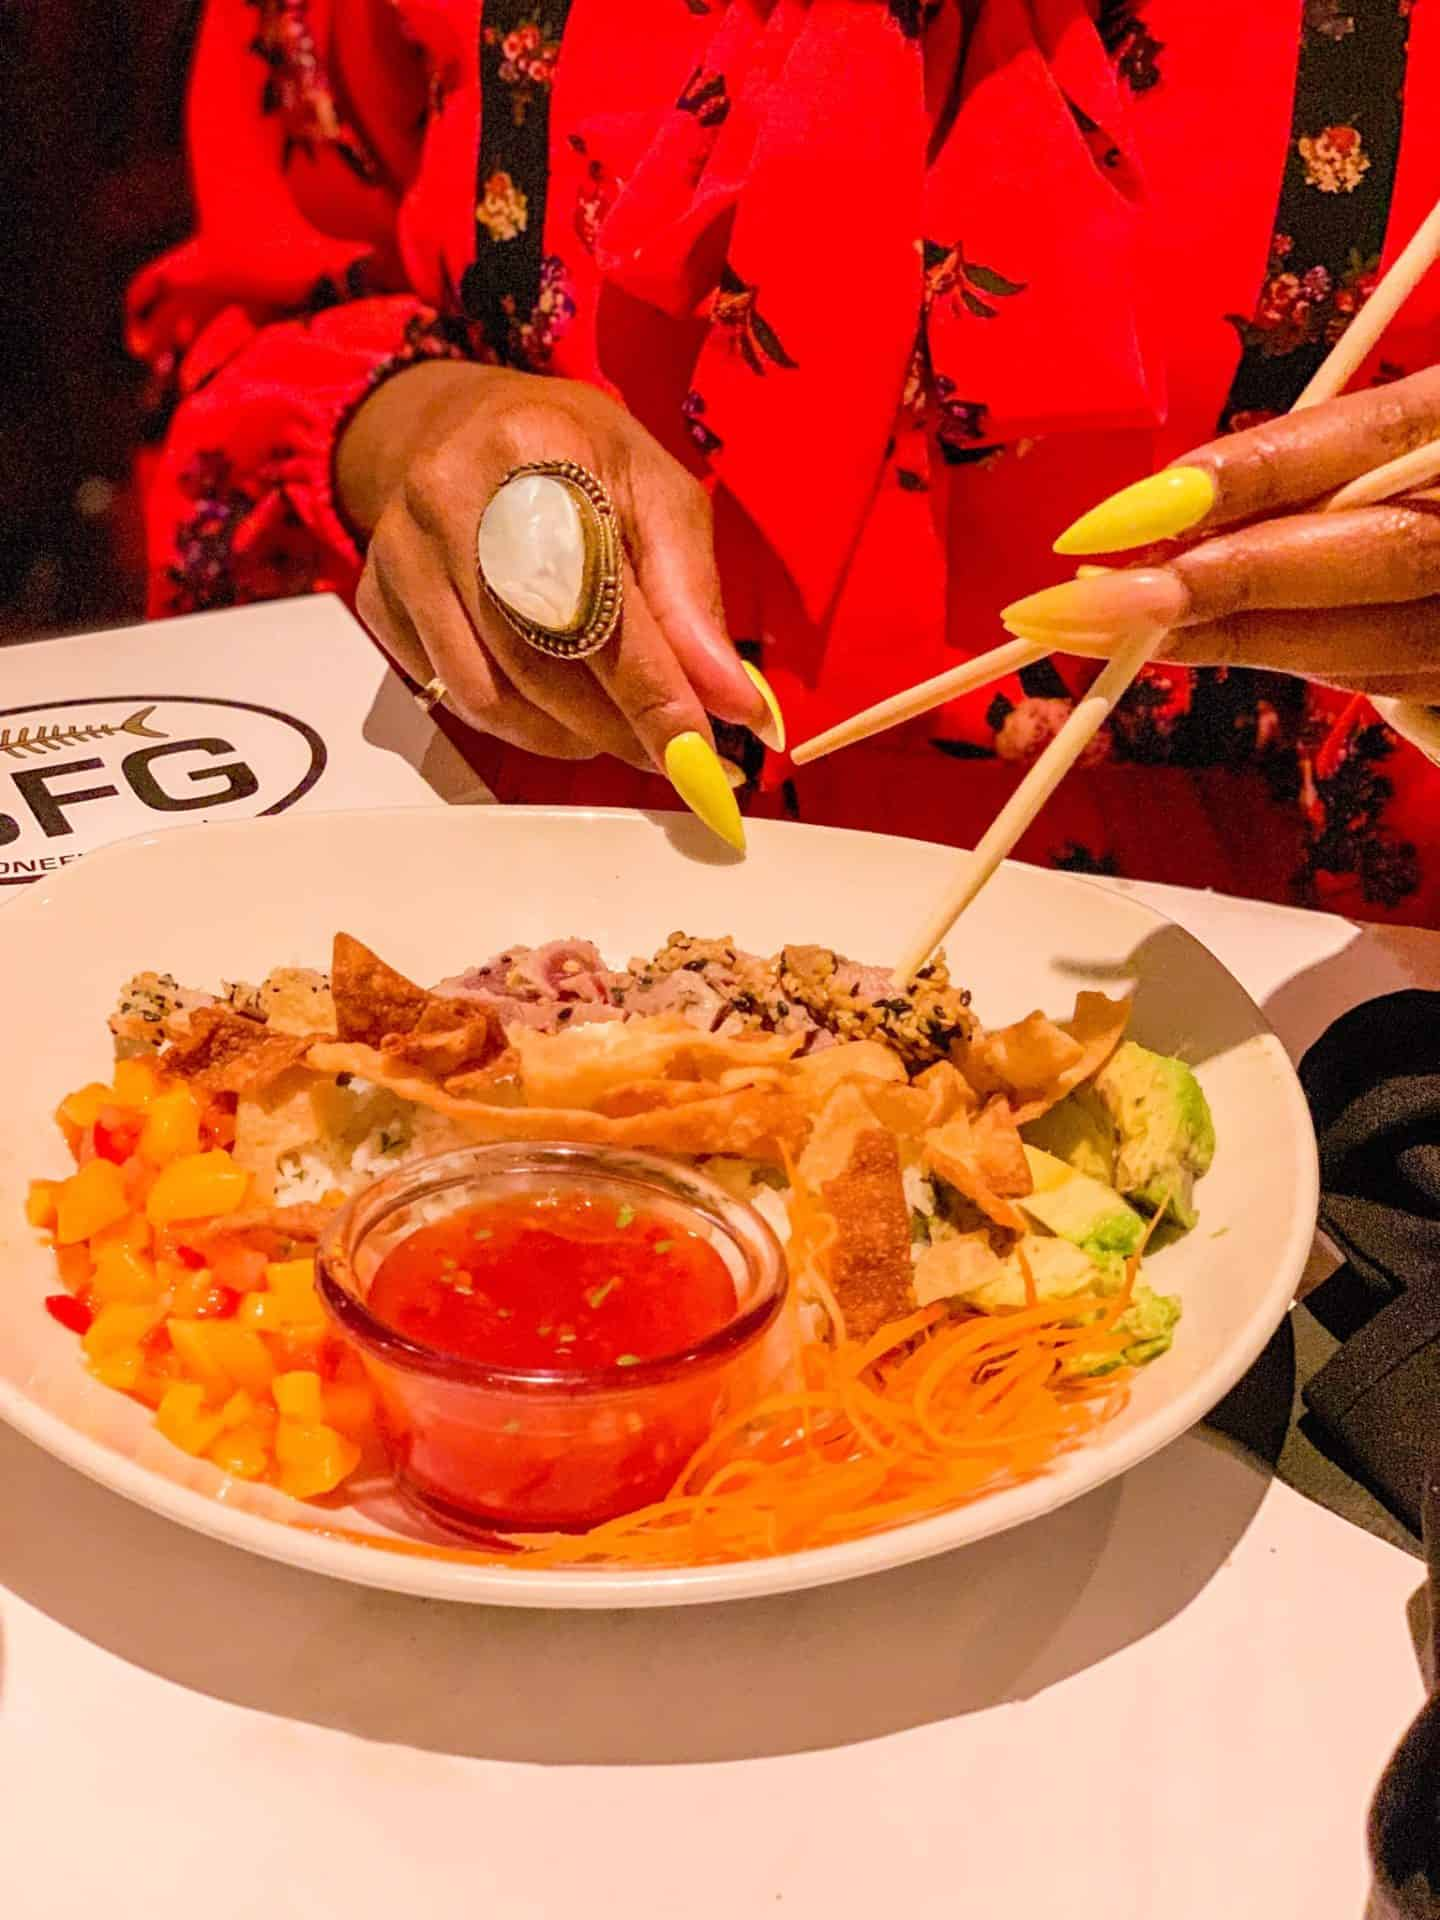 ShaundaNecole.com Our Valentine's Dinner At Bonefish Grill- Premium Sushi-Grade Tuna Bowl and Chopsticks